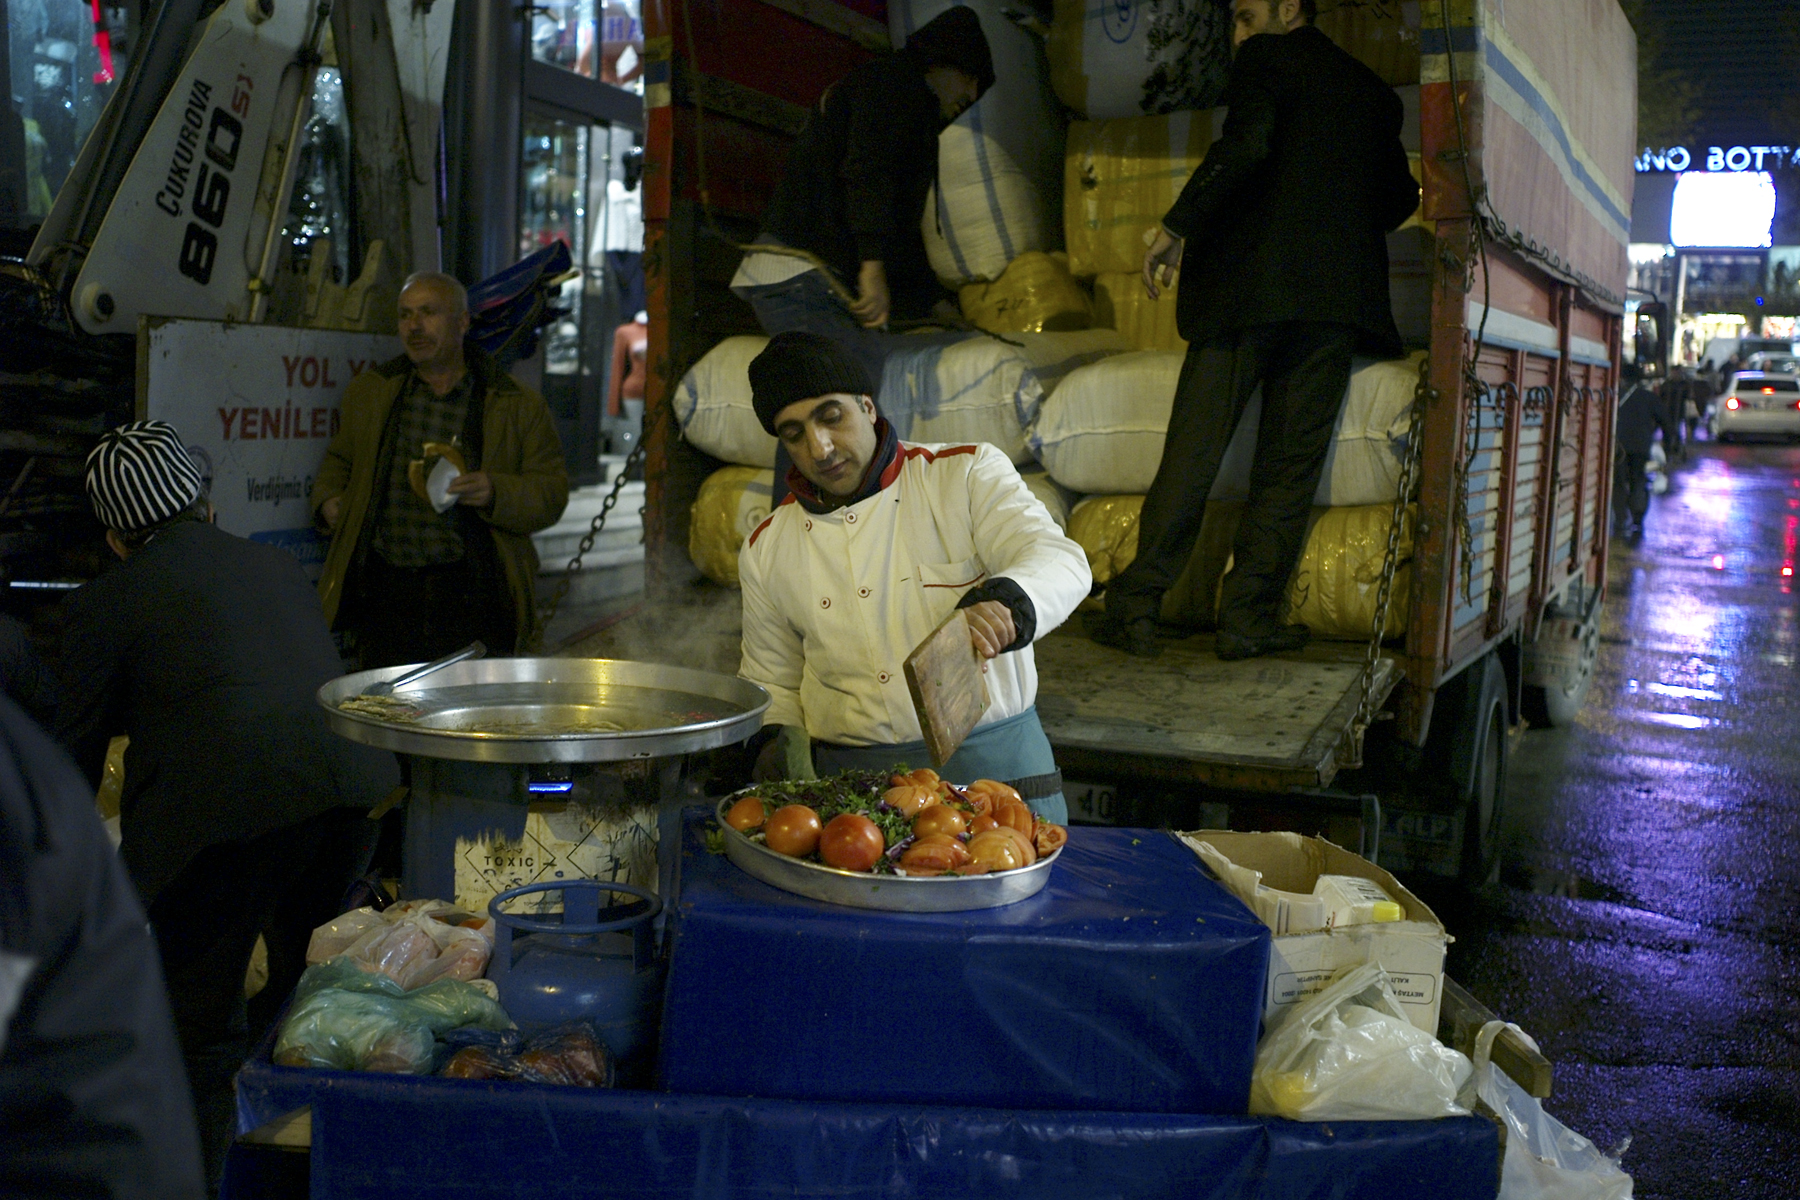 L1001466/ Стамбул, ноябрь 2011